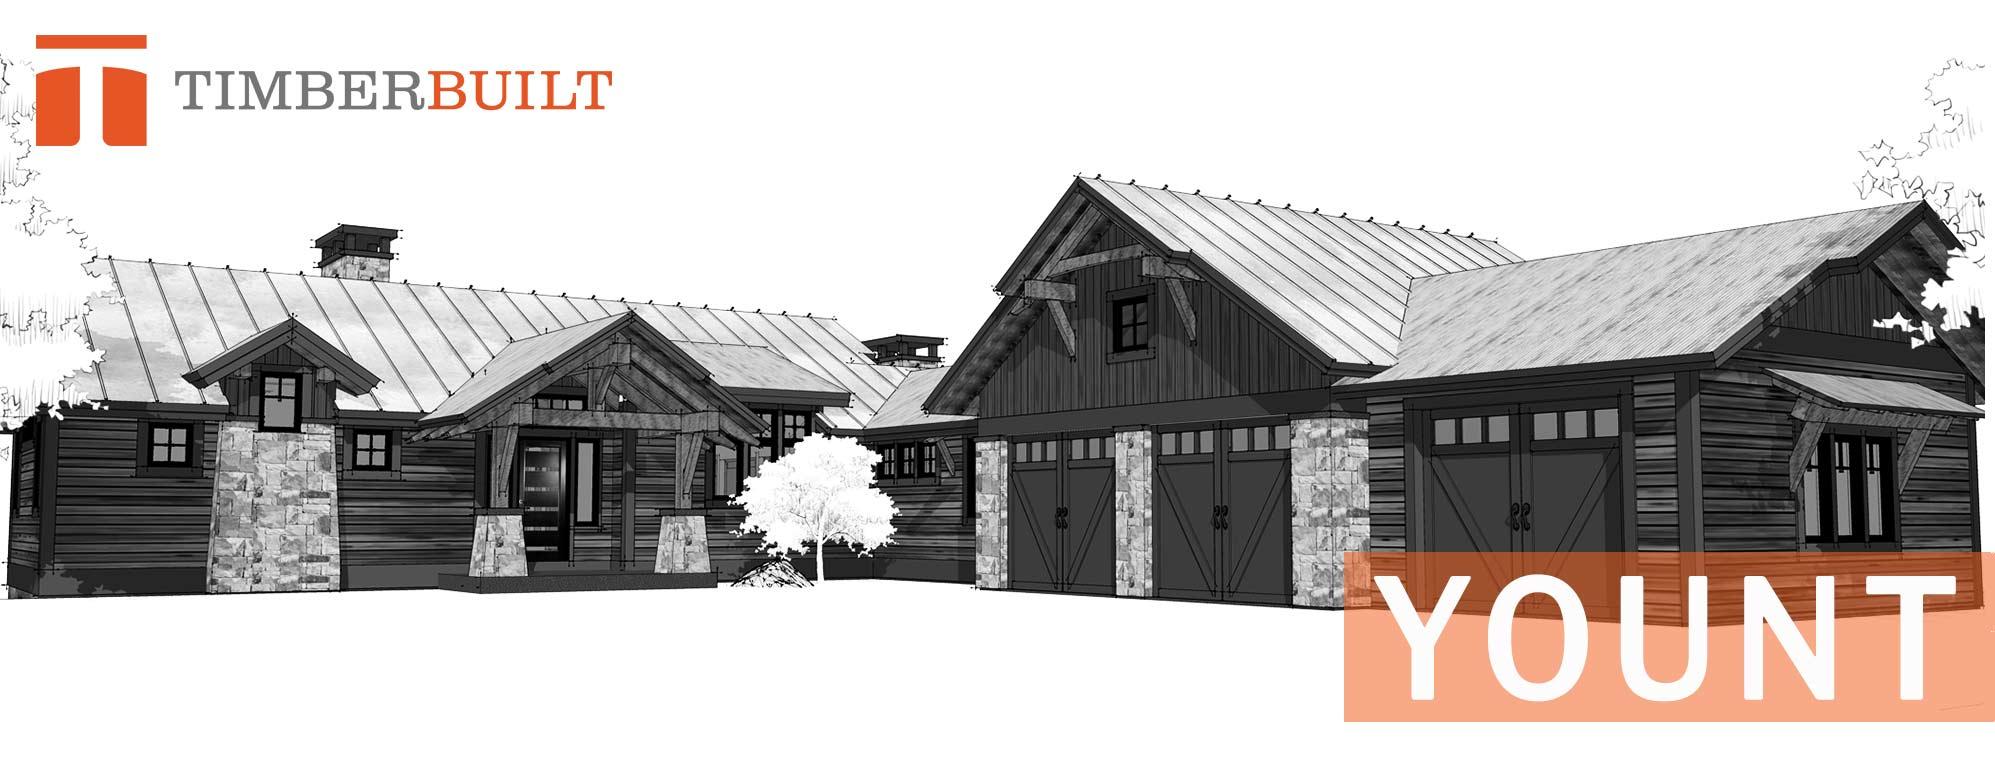 Yount | Timber Frame Home Designs | Timberbuilt